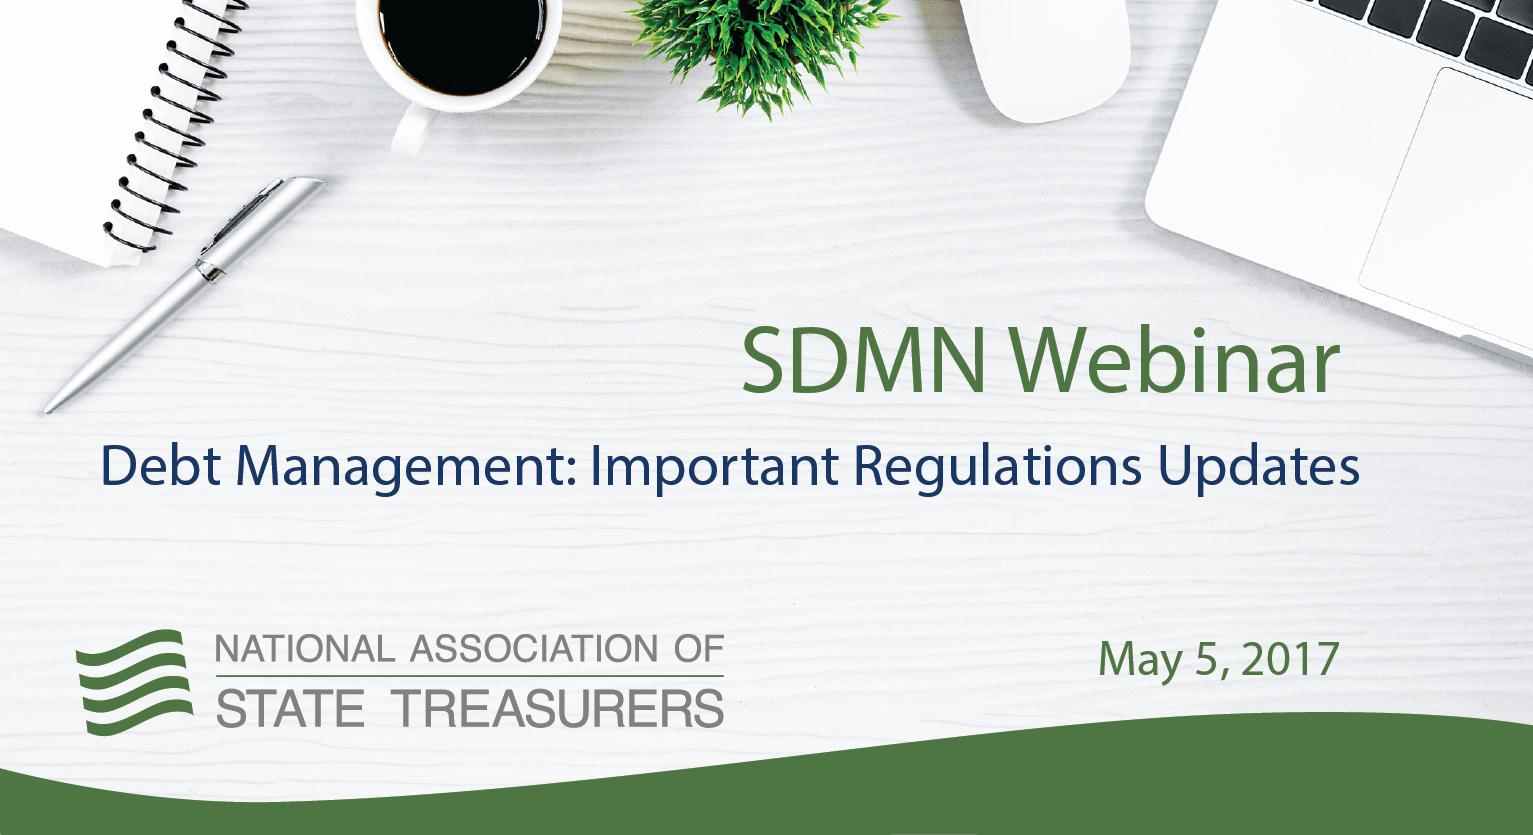 Debt Management: Important Regulations Updates